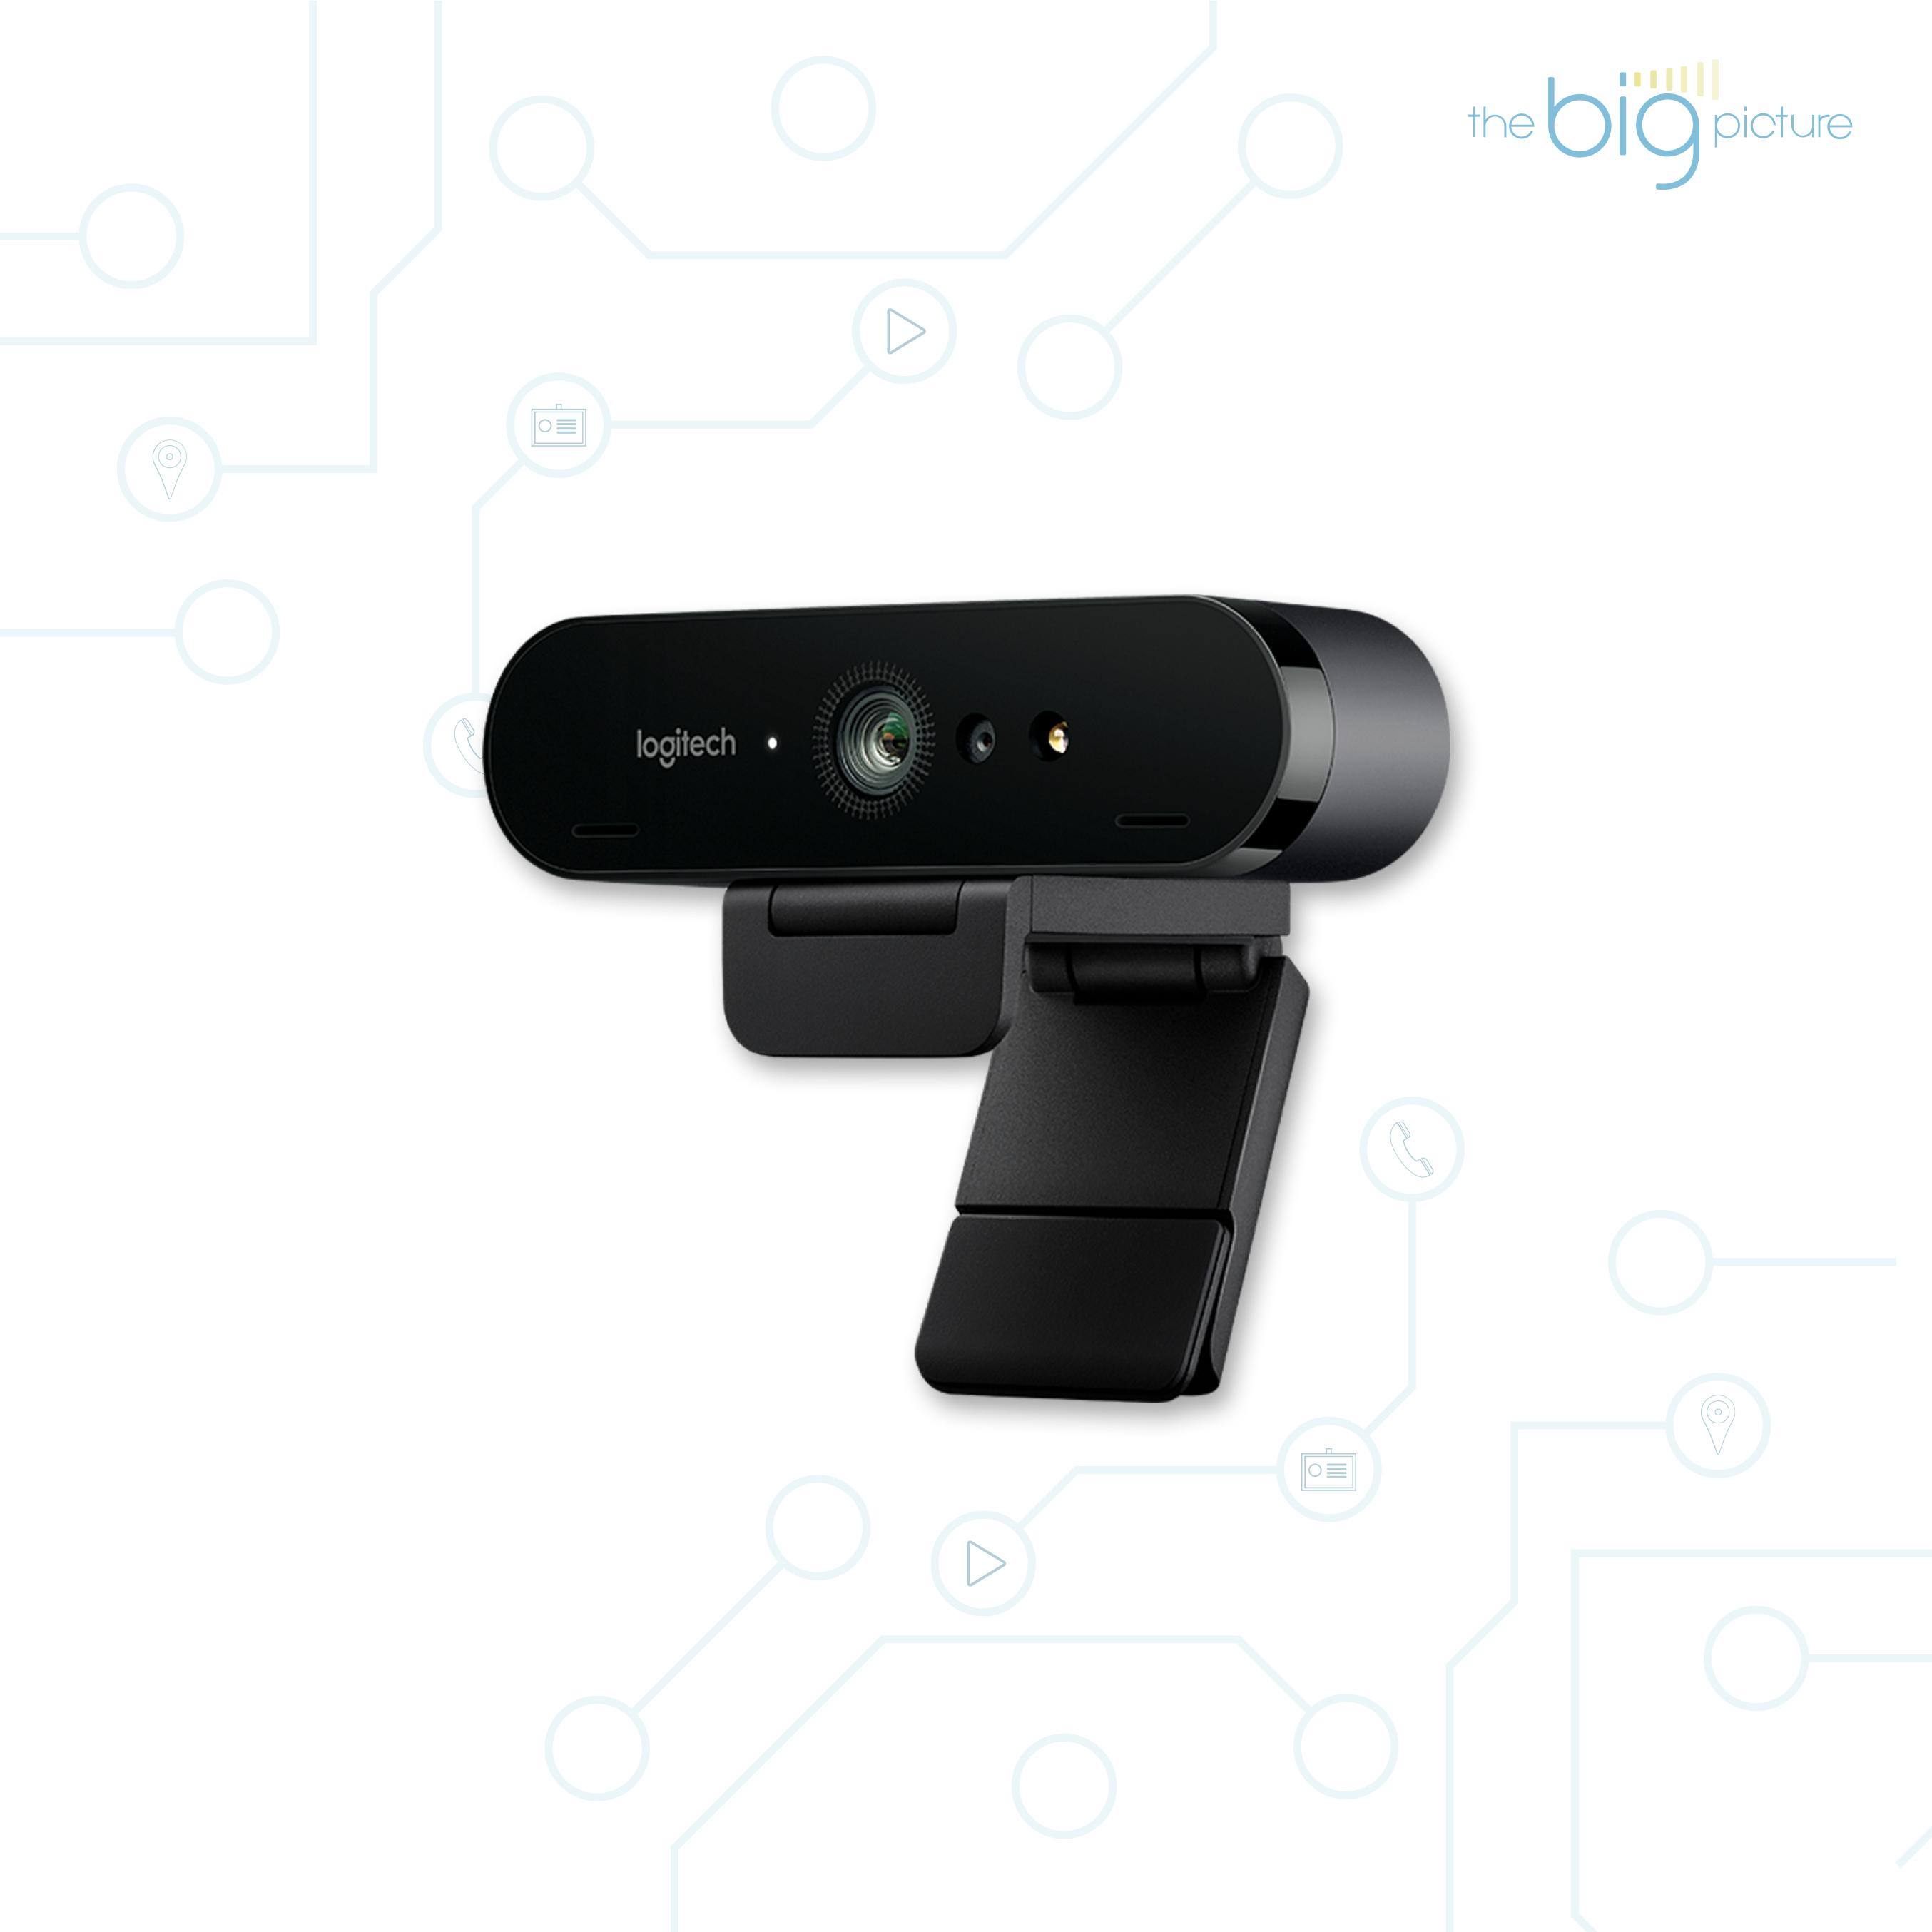 Logitech Brio - technologically advanced web camera.